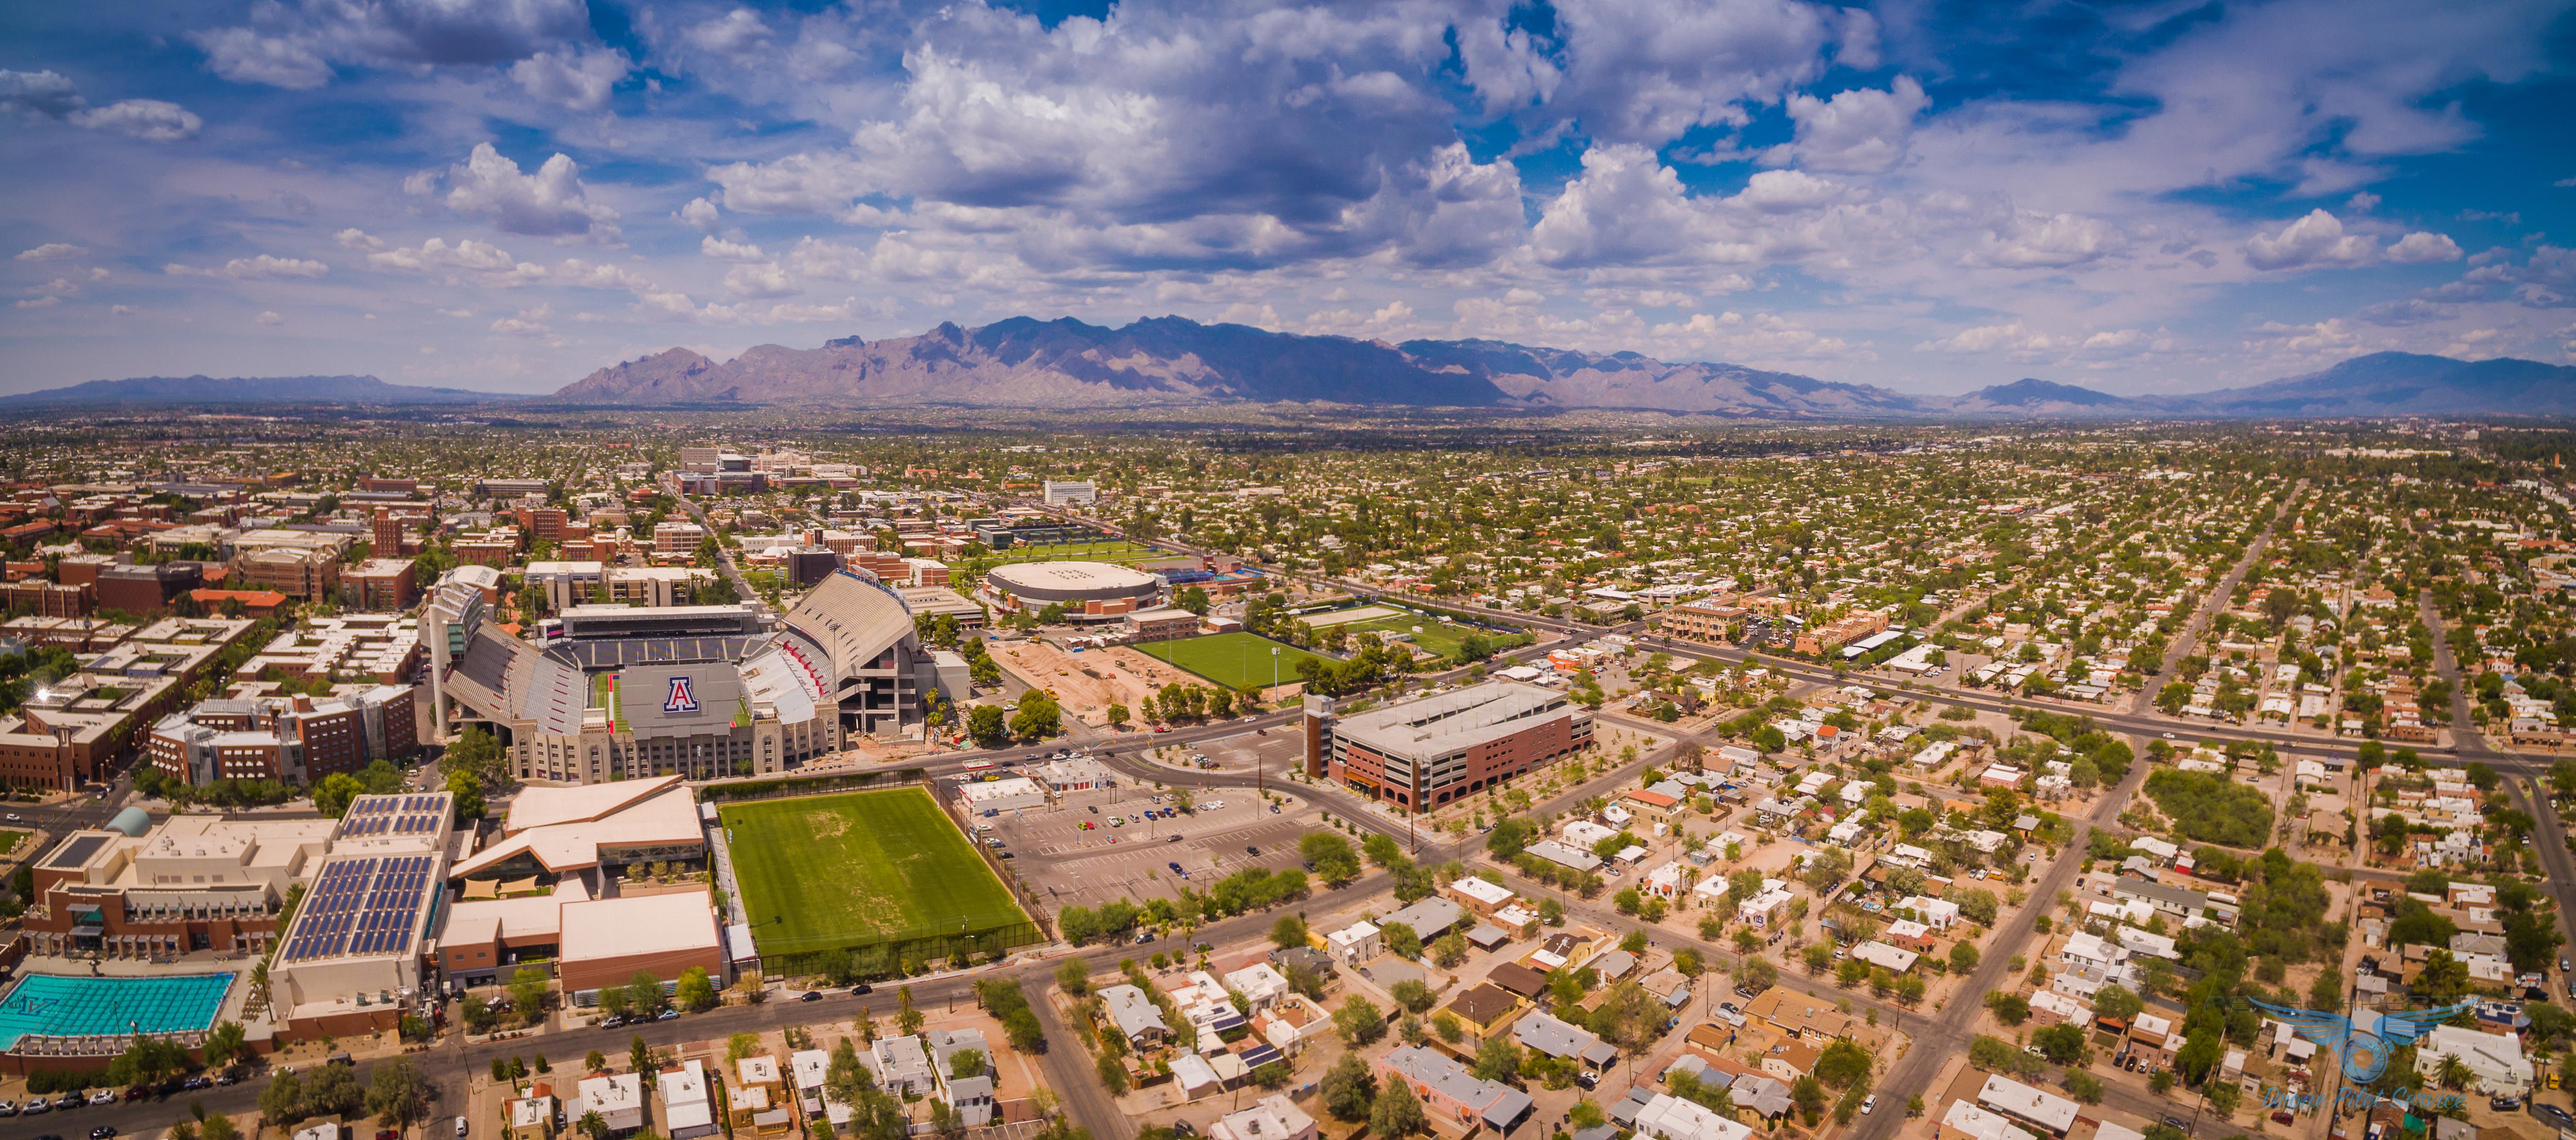 LZorilla_Tucson_Midtown_UofA_DroneVew_Ae